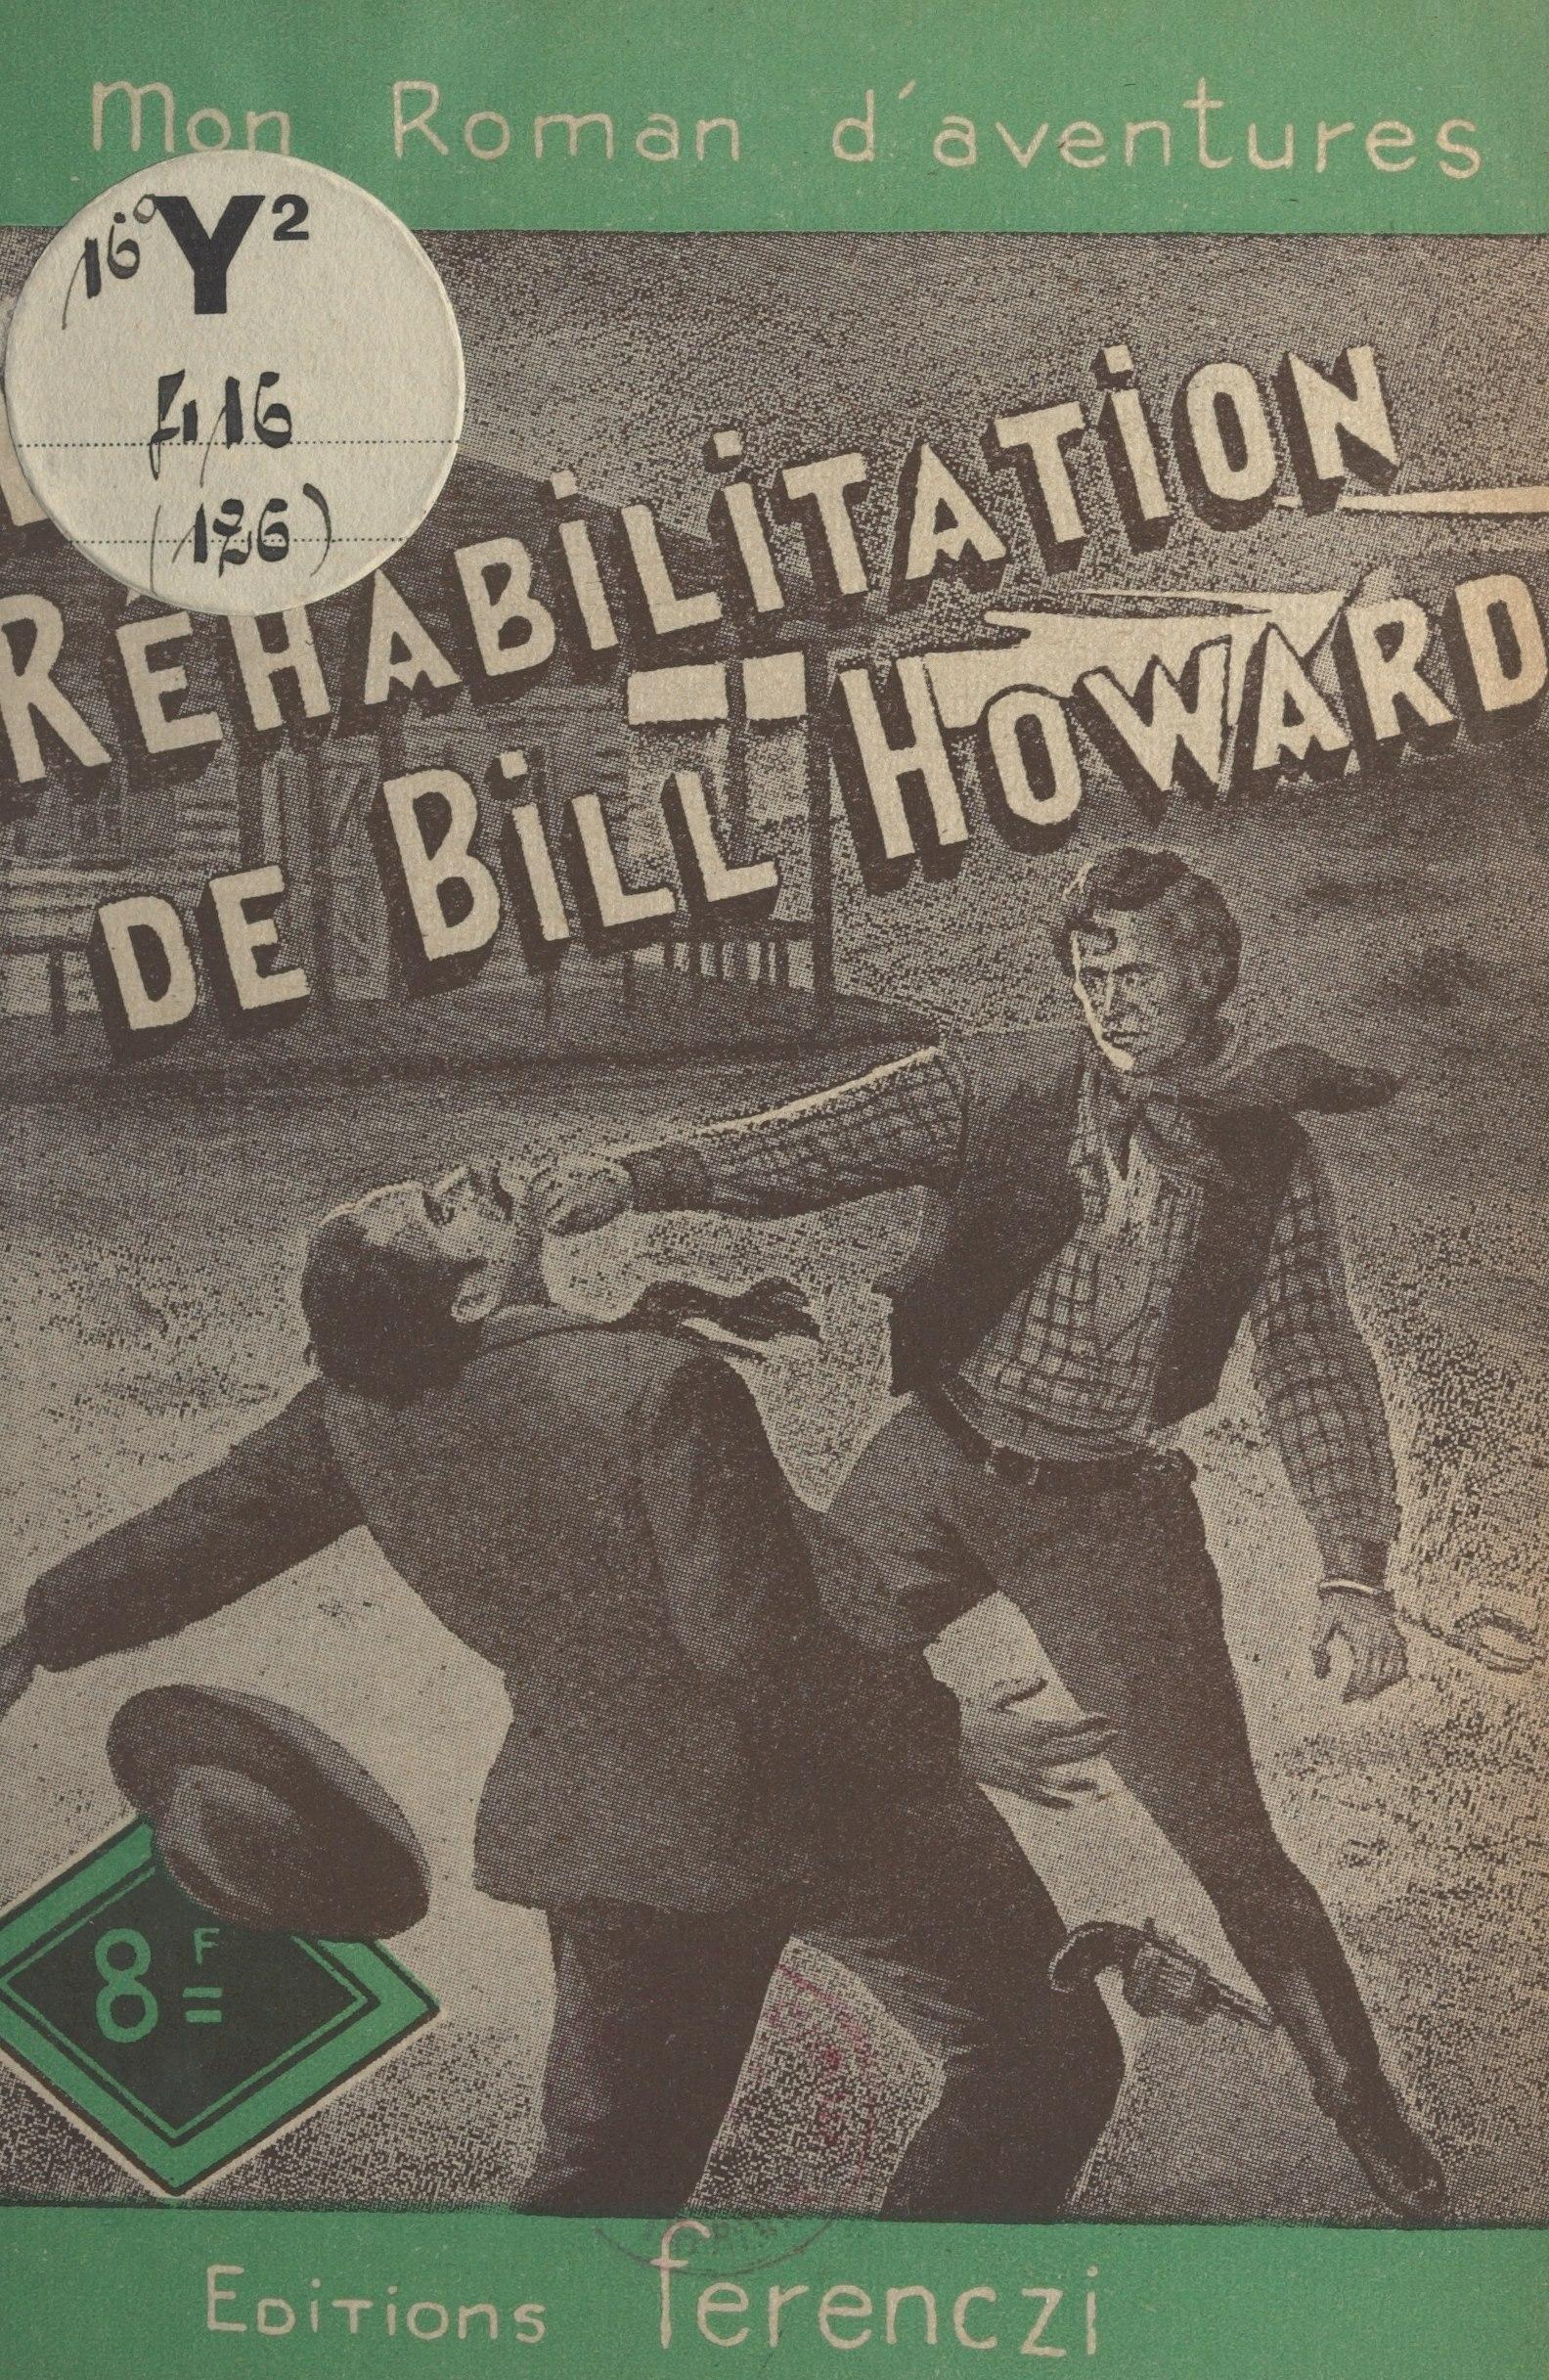 La réhabilitation de Bill Howard